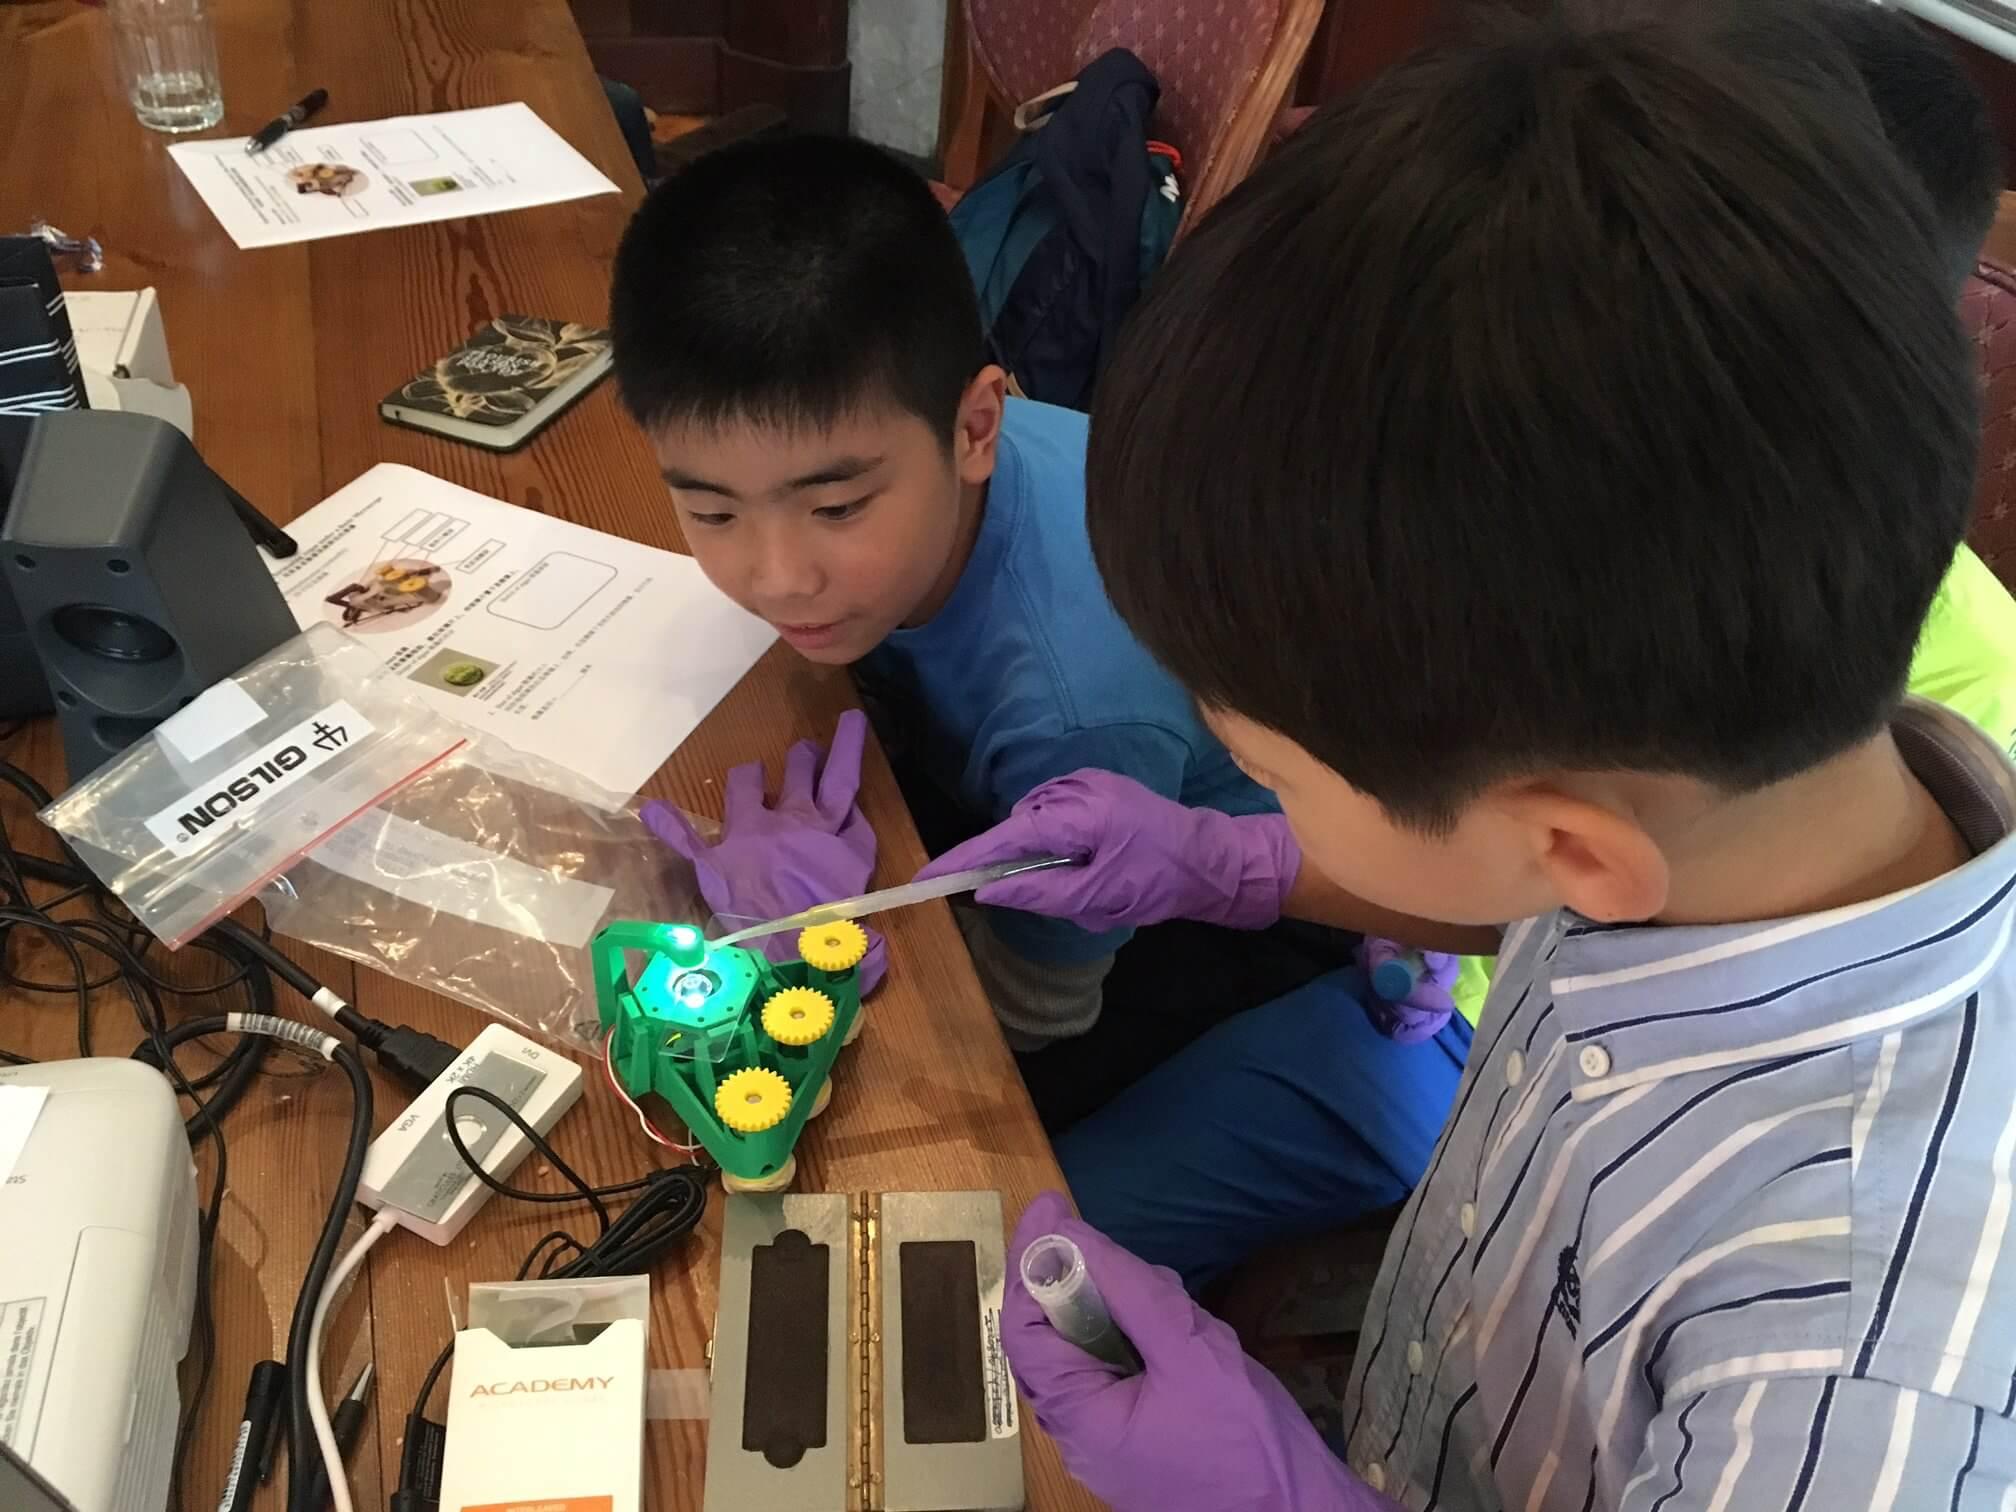 Openflexure_Microscope_children_chinese_user